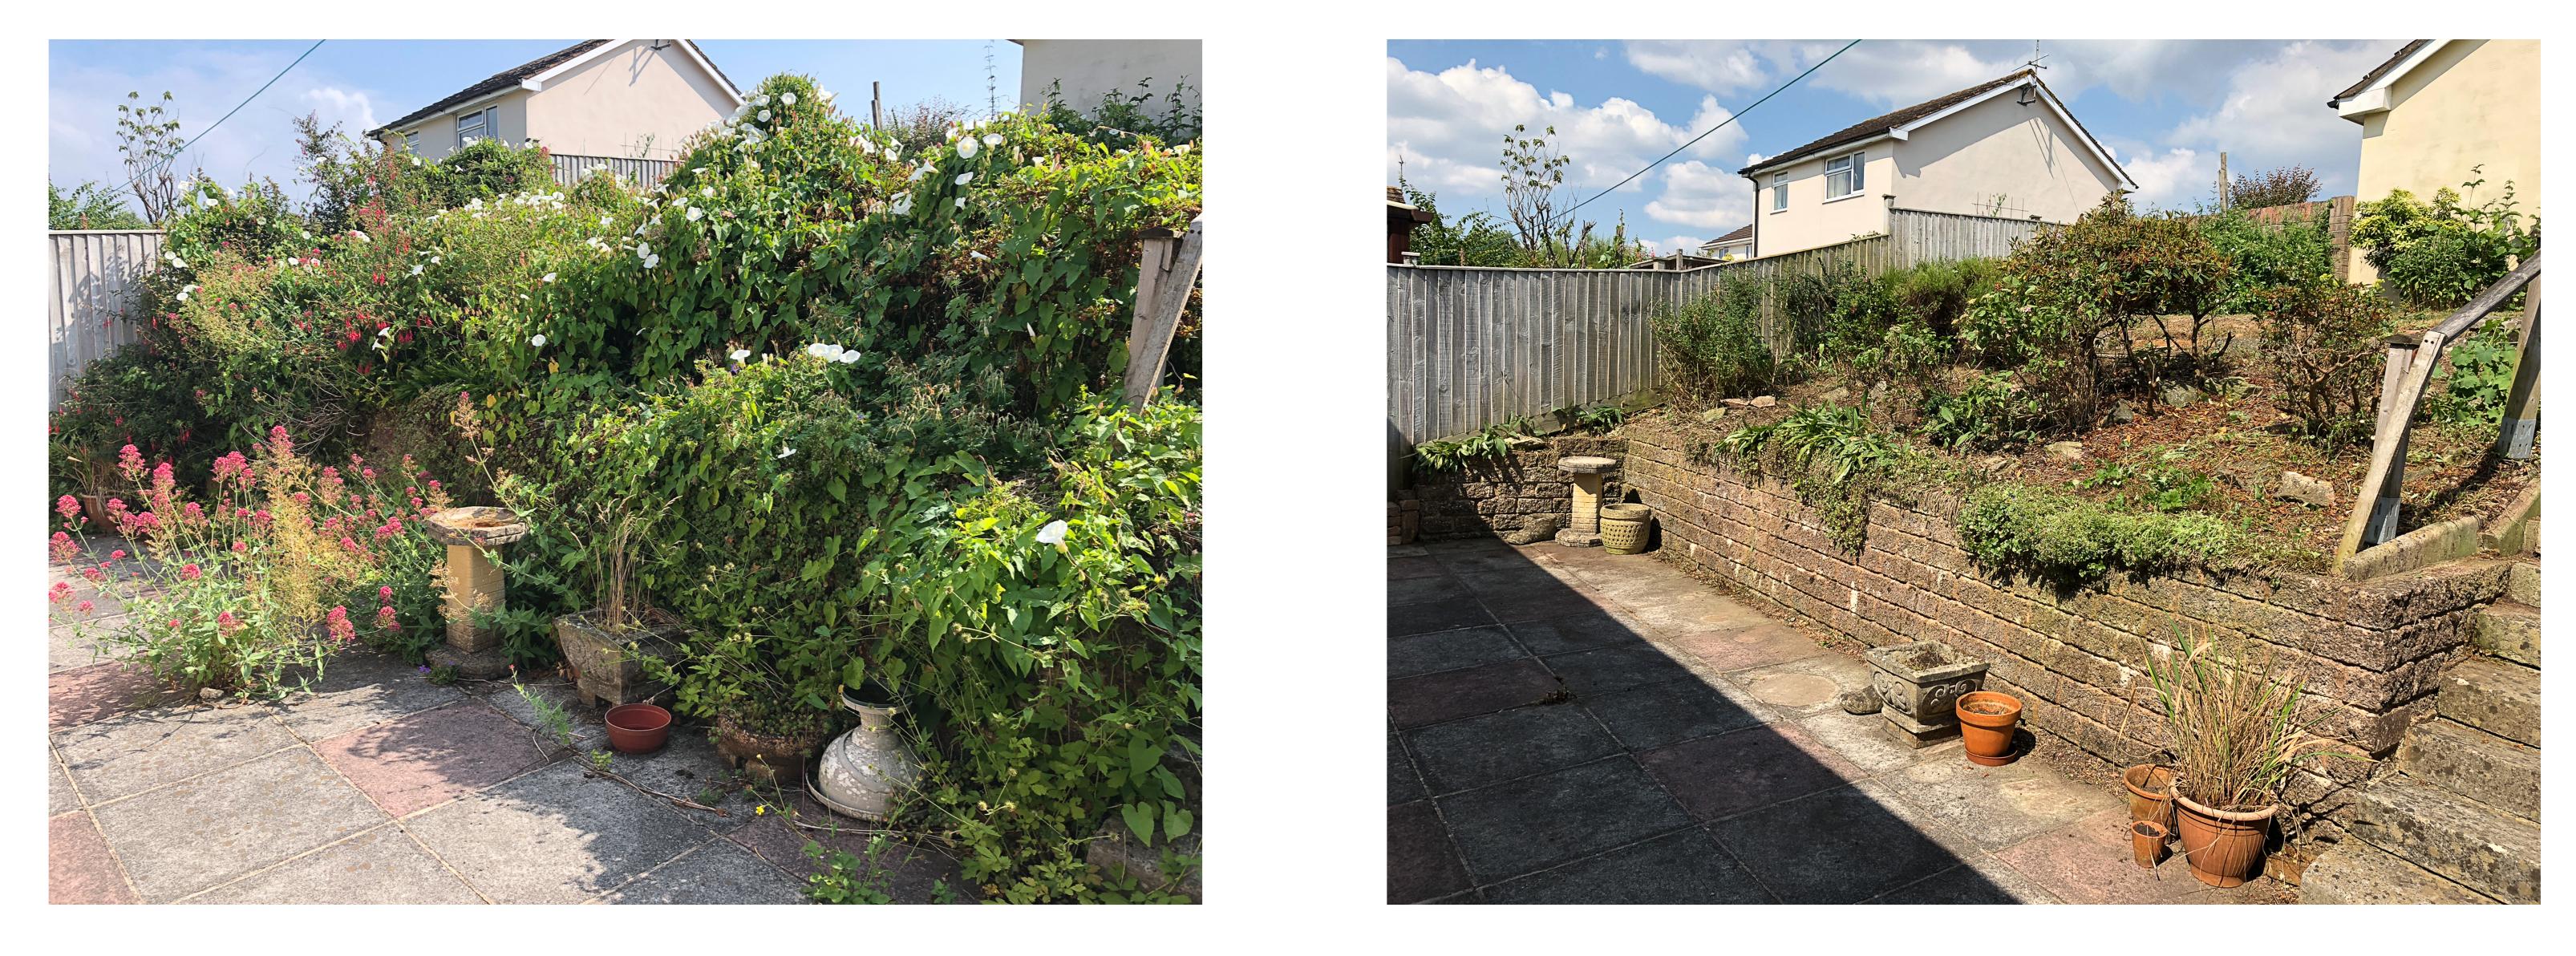 Garden clearance Honiton July 2018